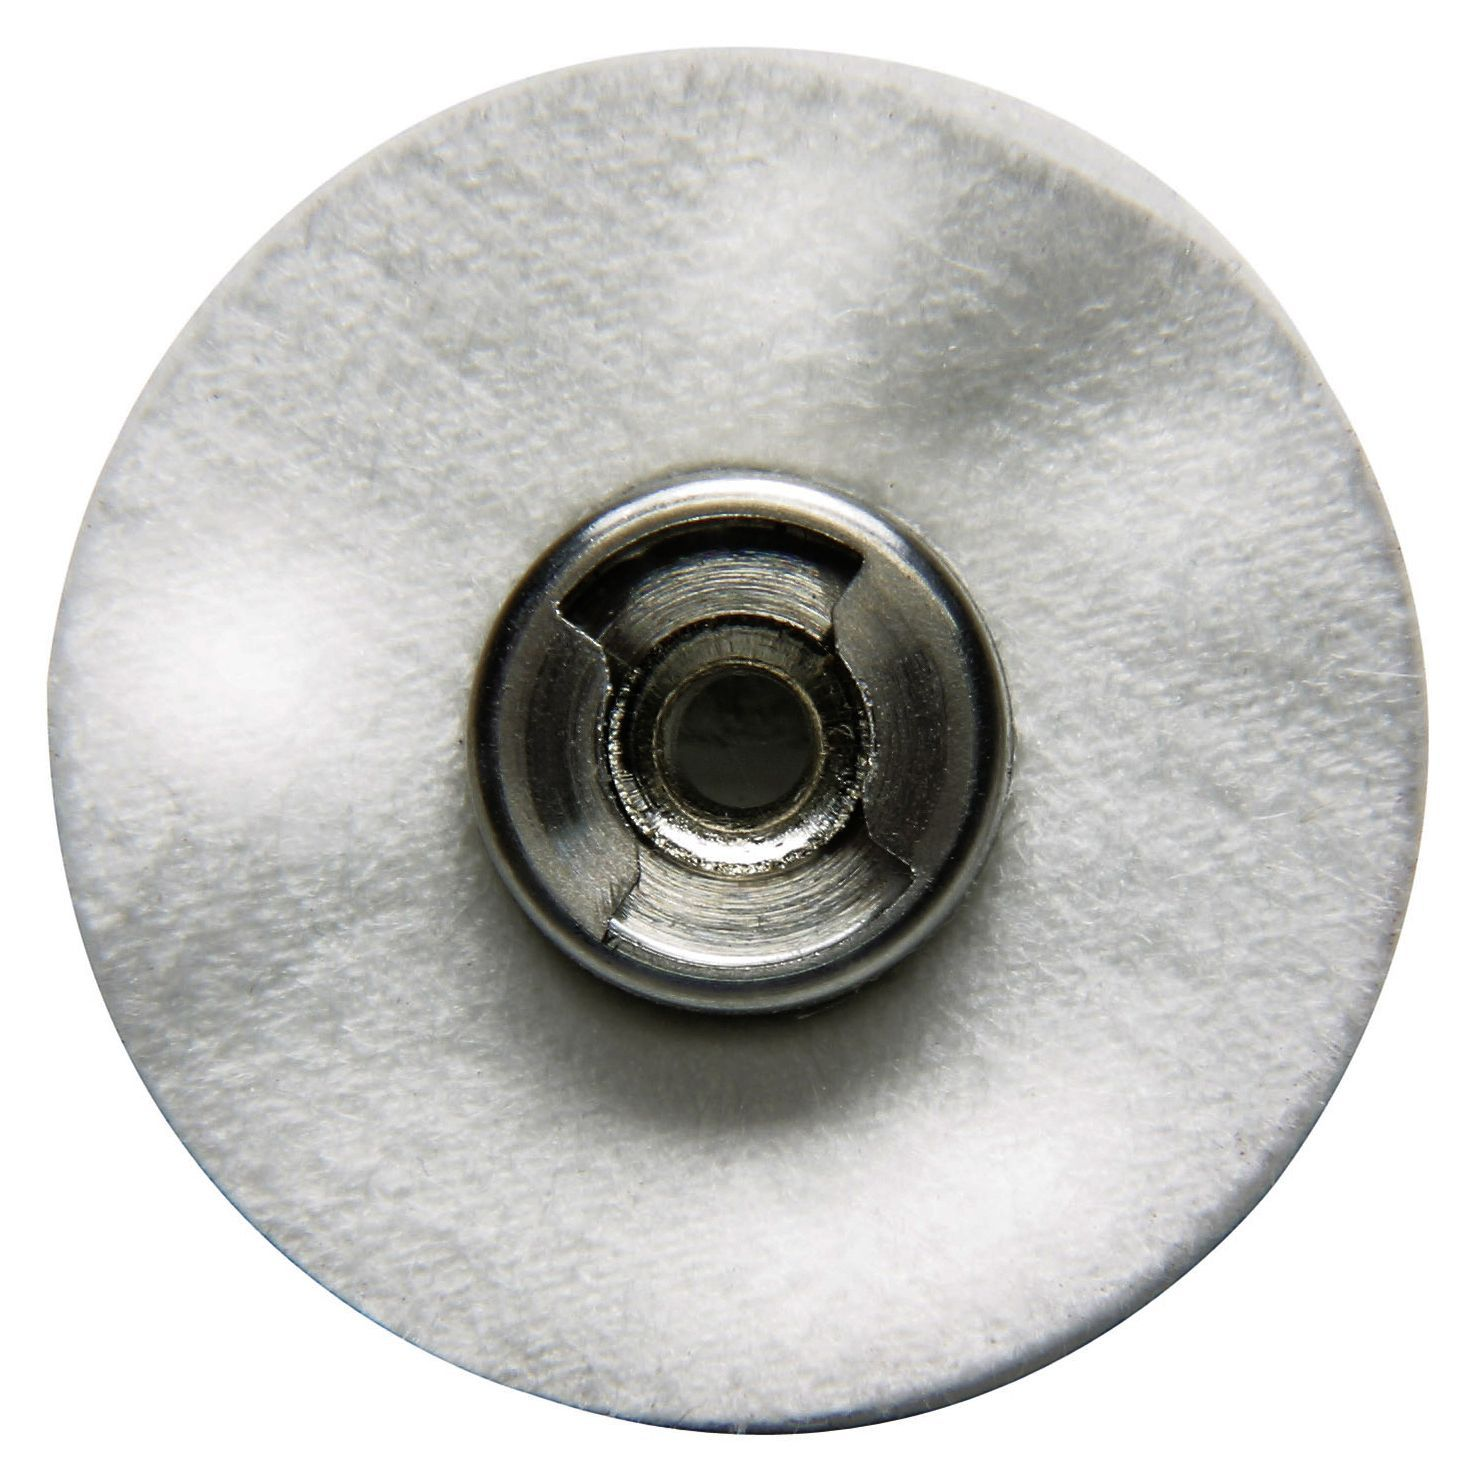 Dremel SC544 SpeedClic Wood Cutting Wheel — diameter 38mm